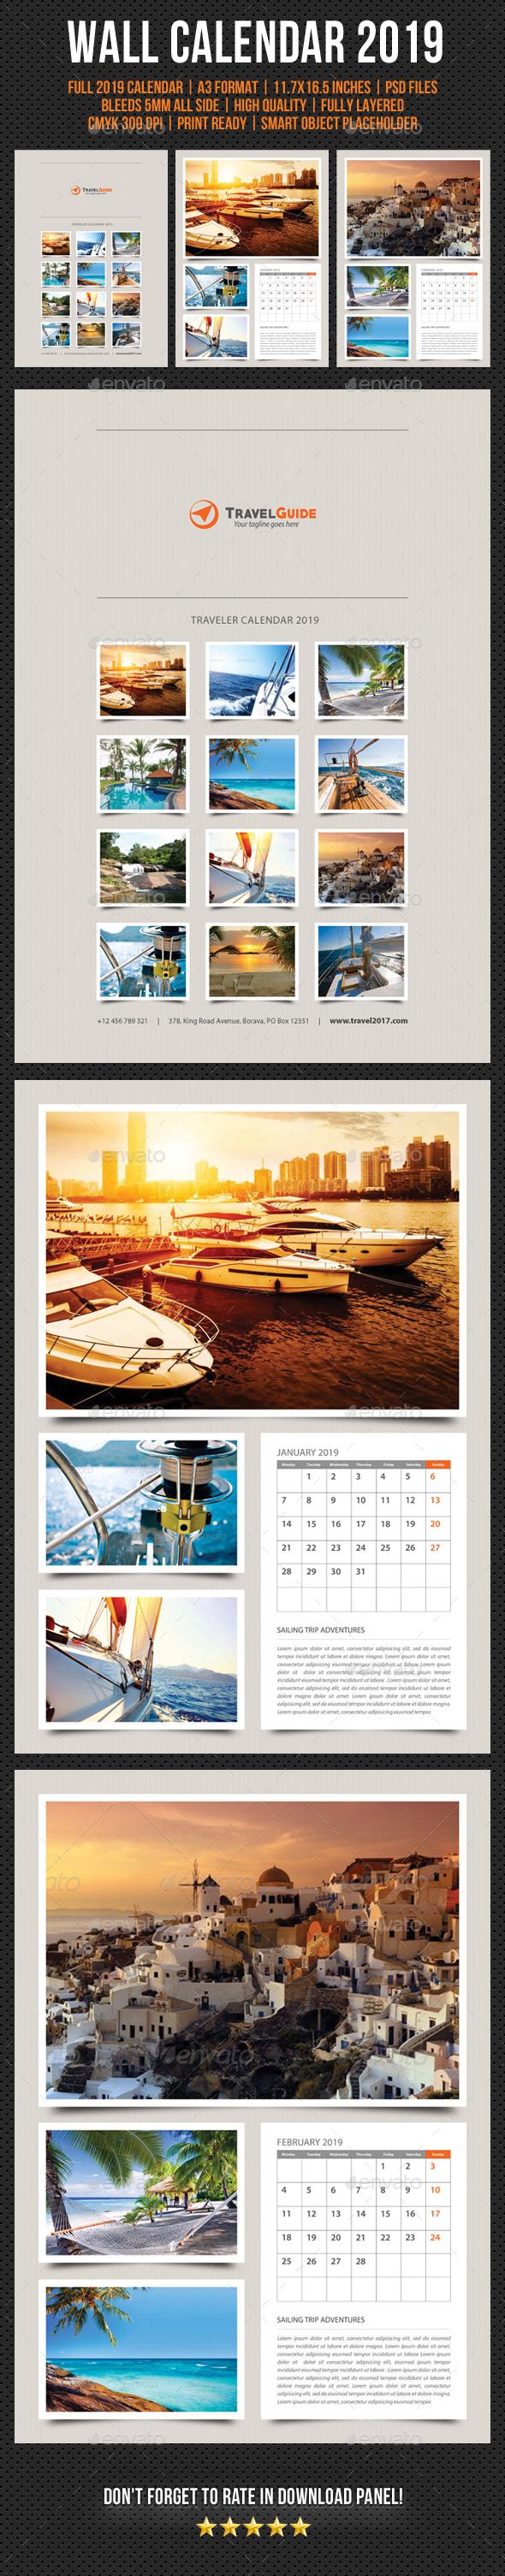 Wall Calendar 2019 V20 - Calendars Stationery